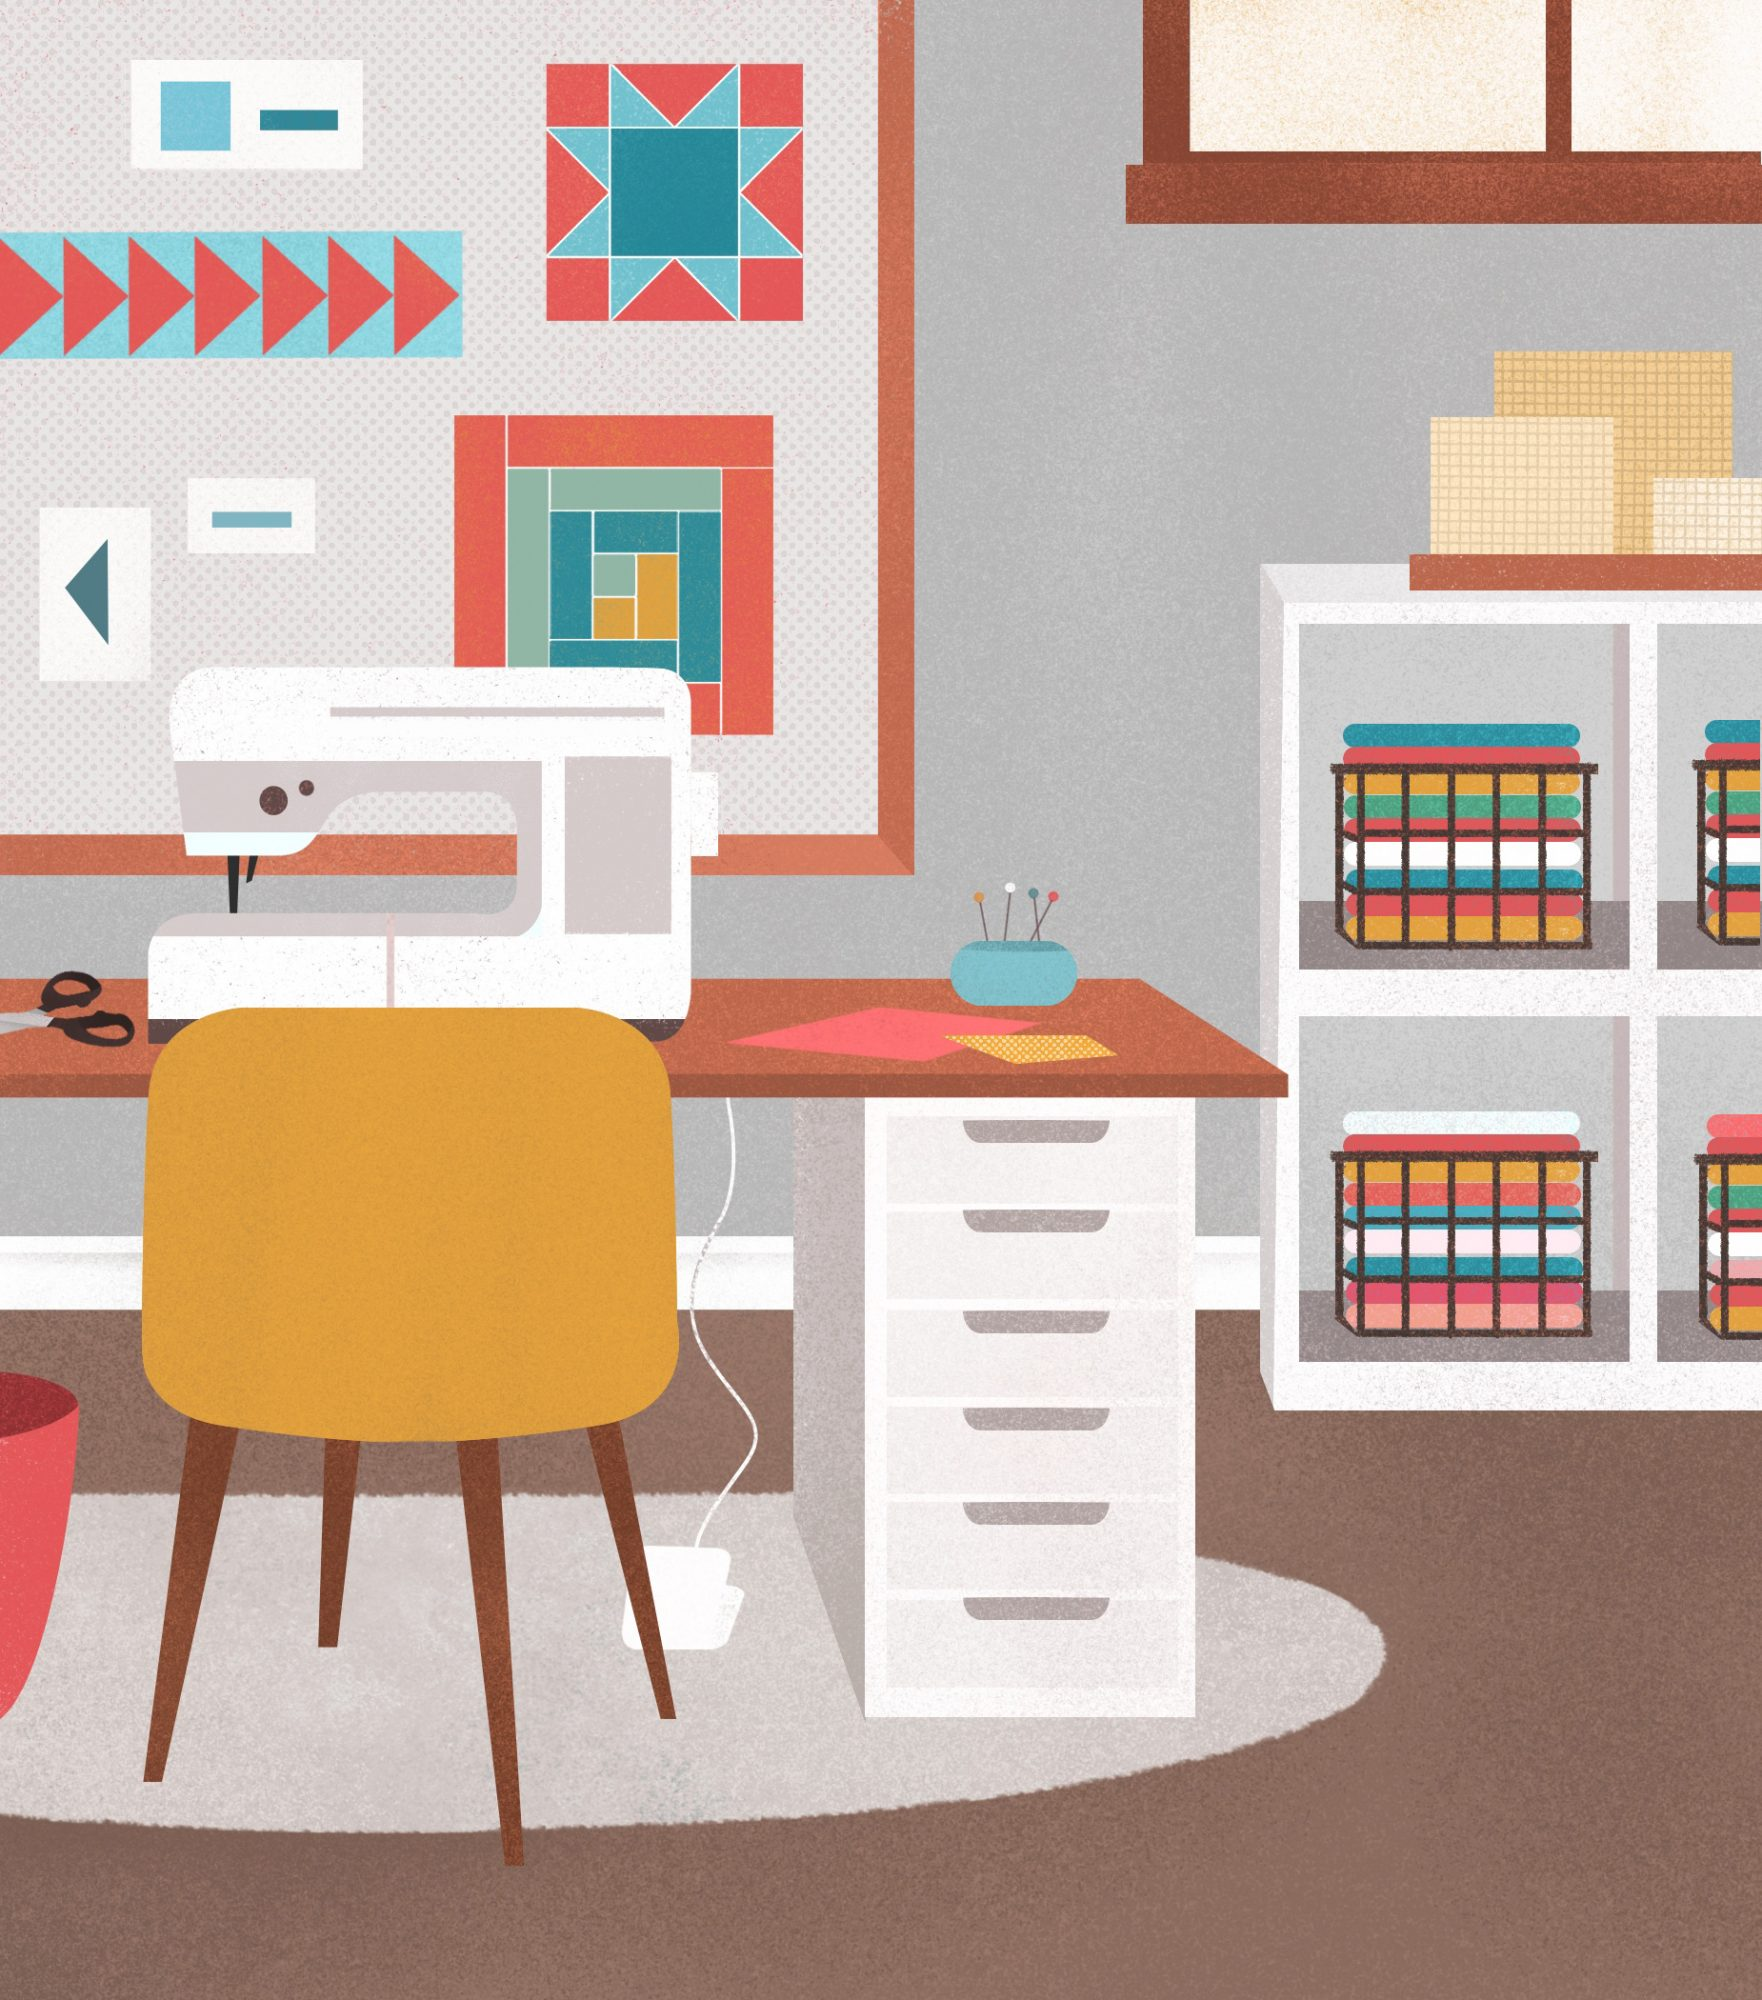 sewing room illustration